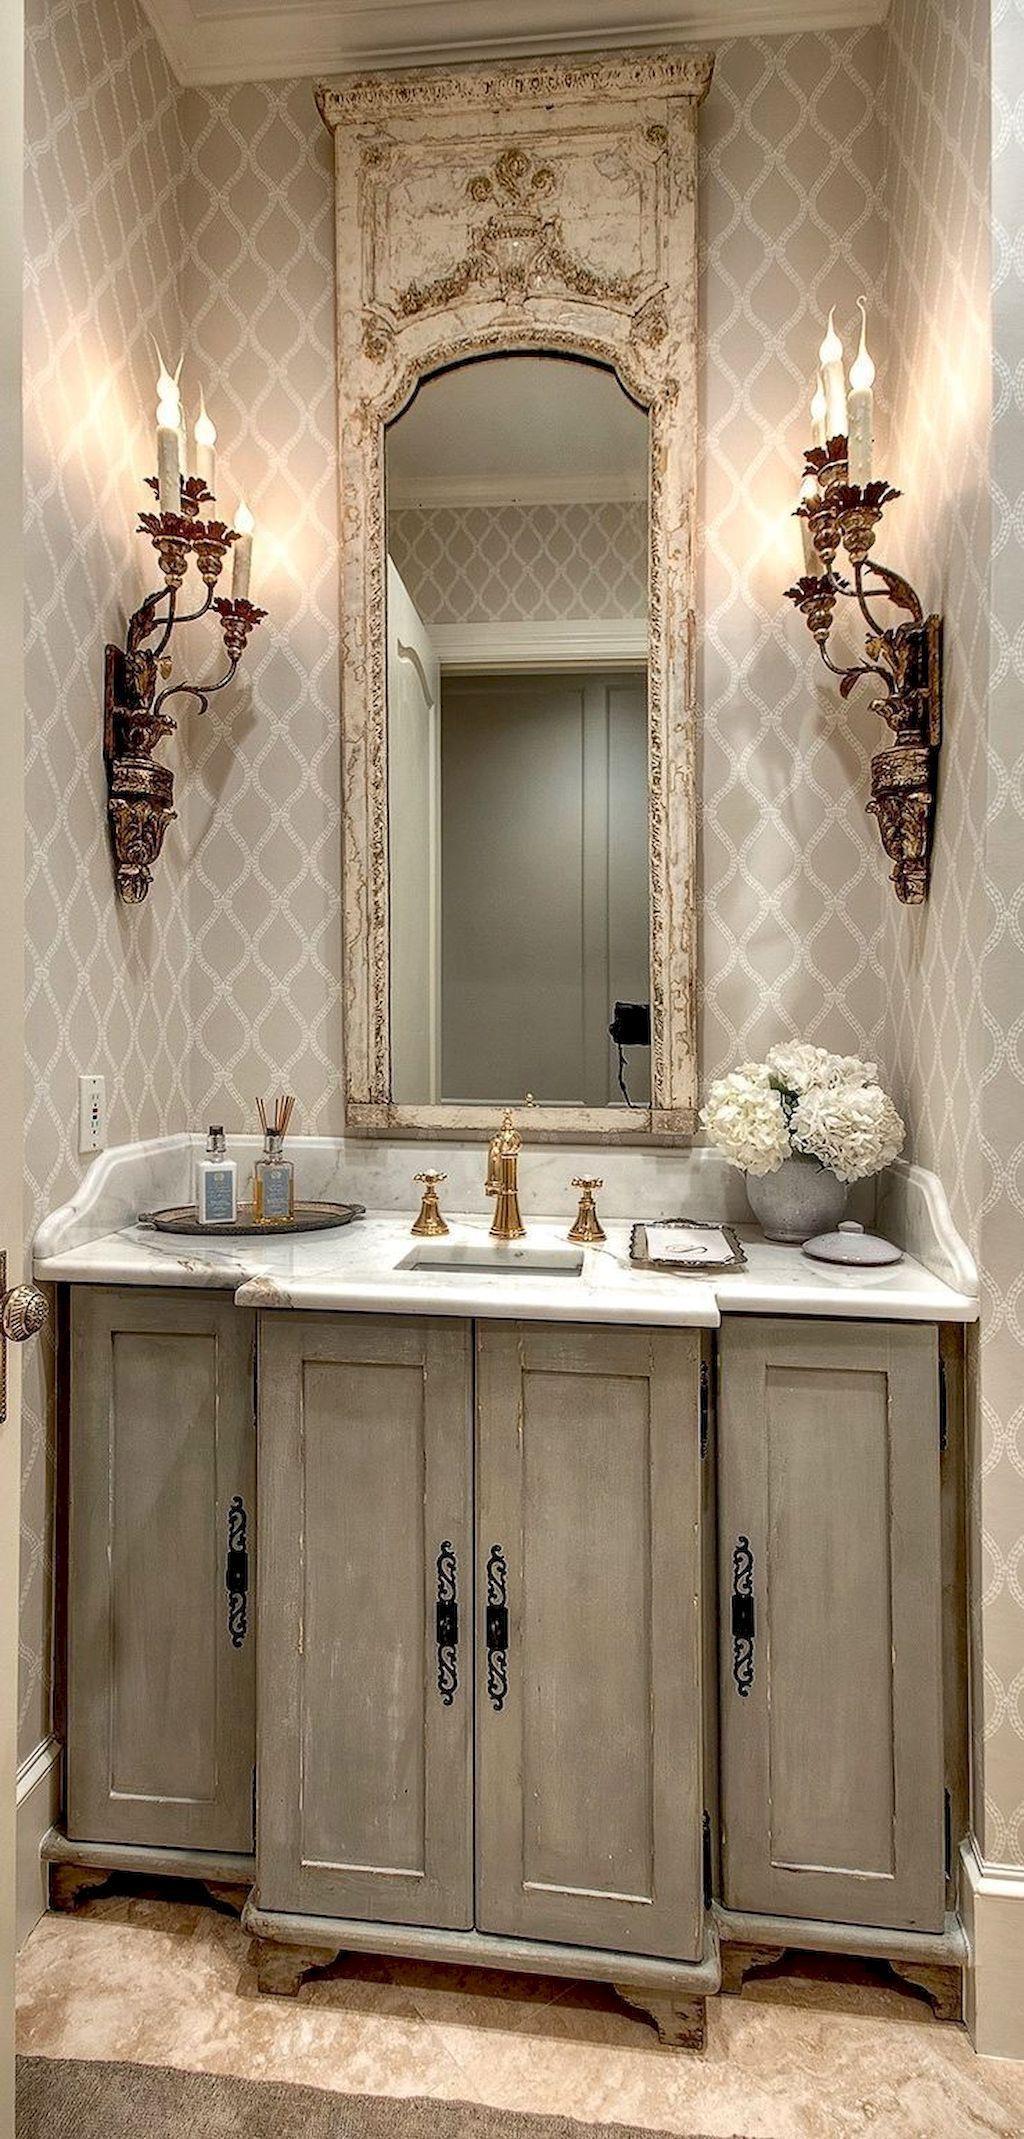 Pin By Bathroom Tour Club On Bathroom Ideas - Pinterest